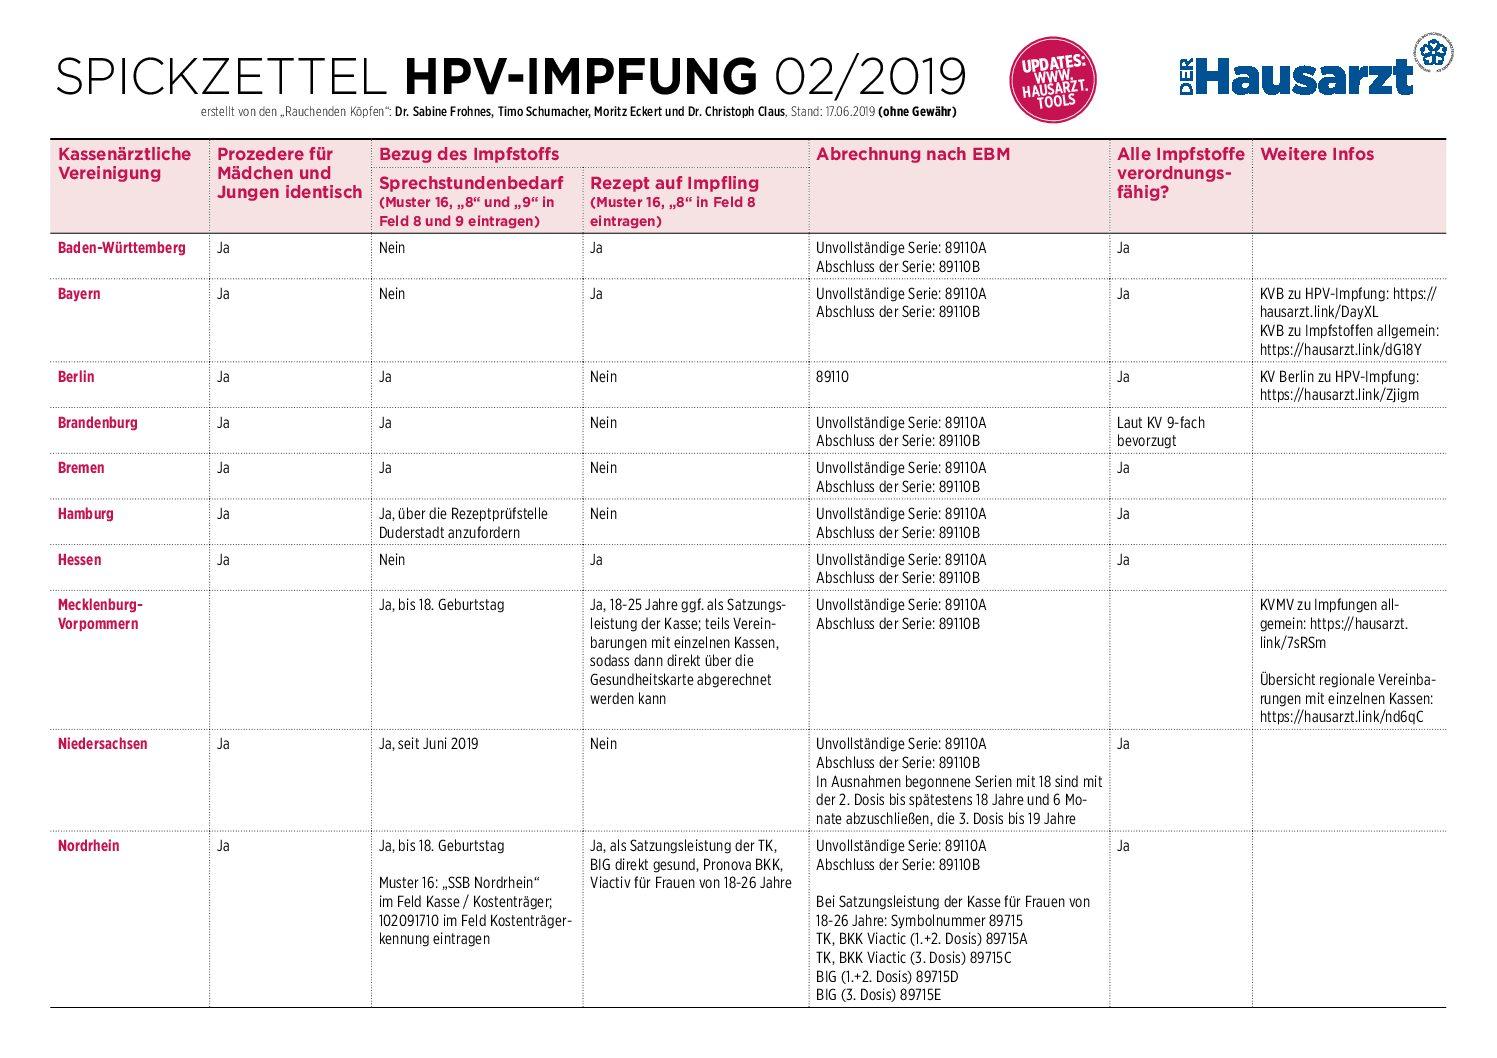 hpv impfung ebm)